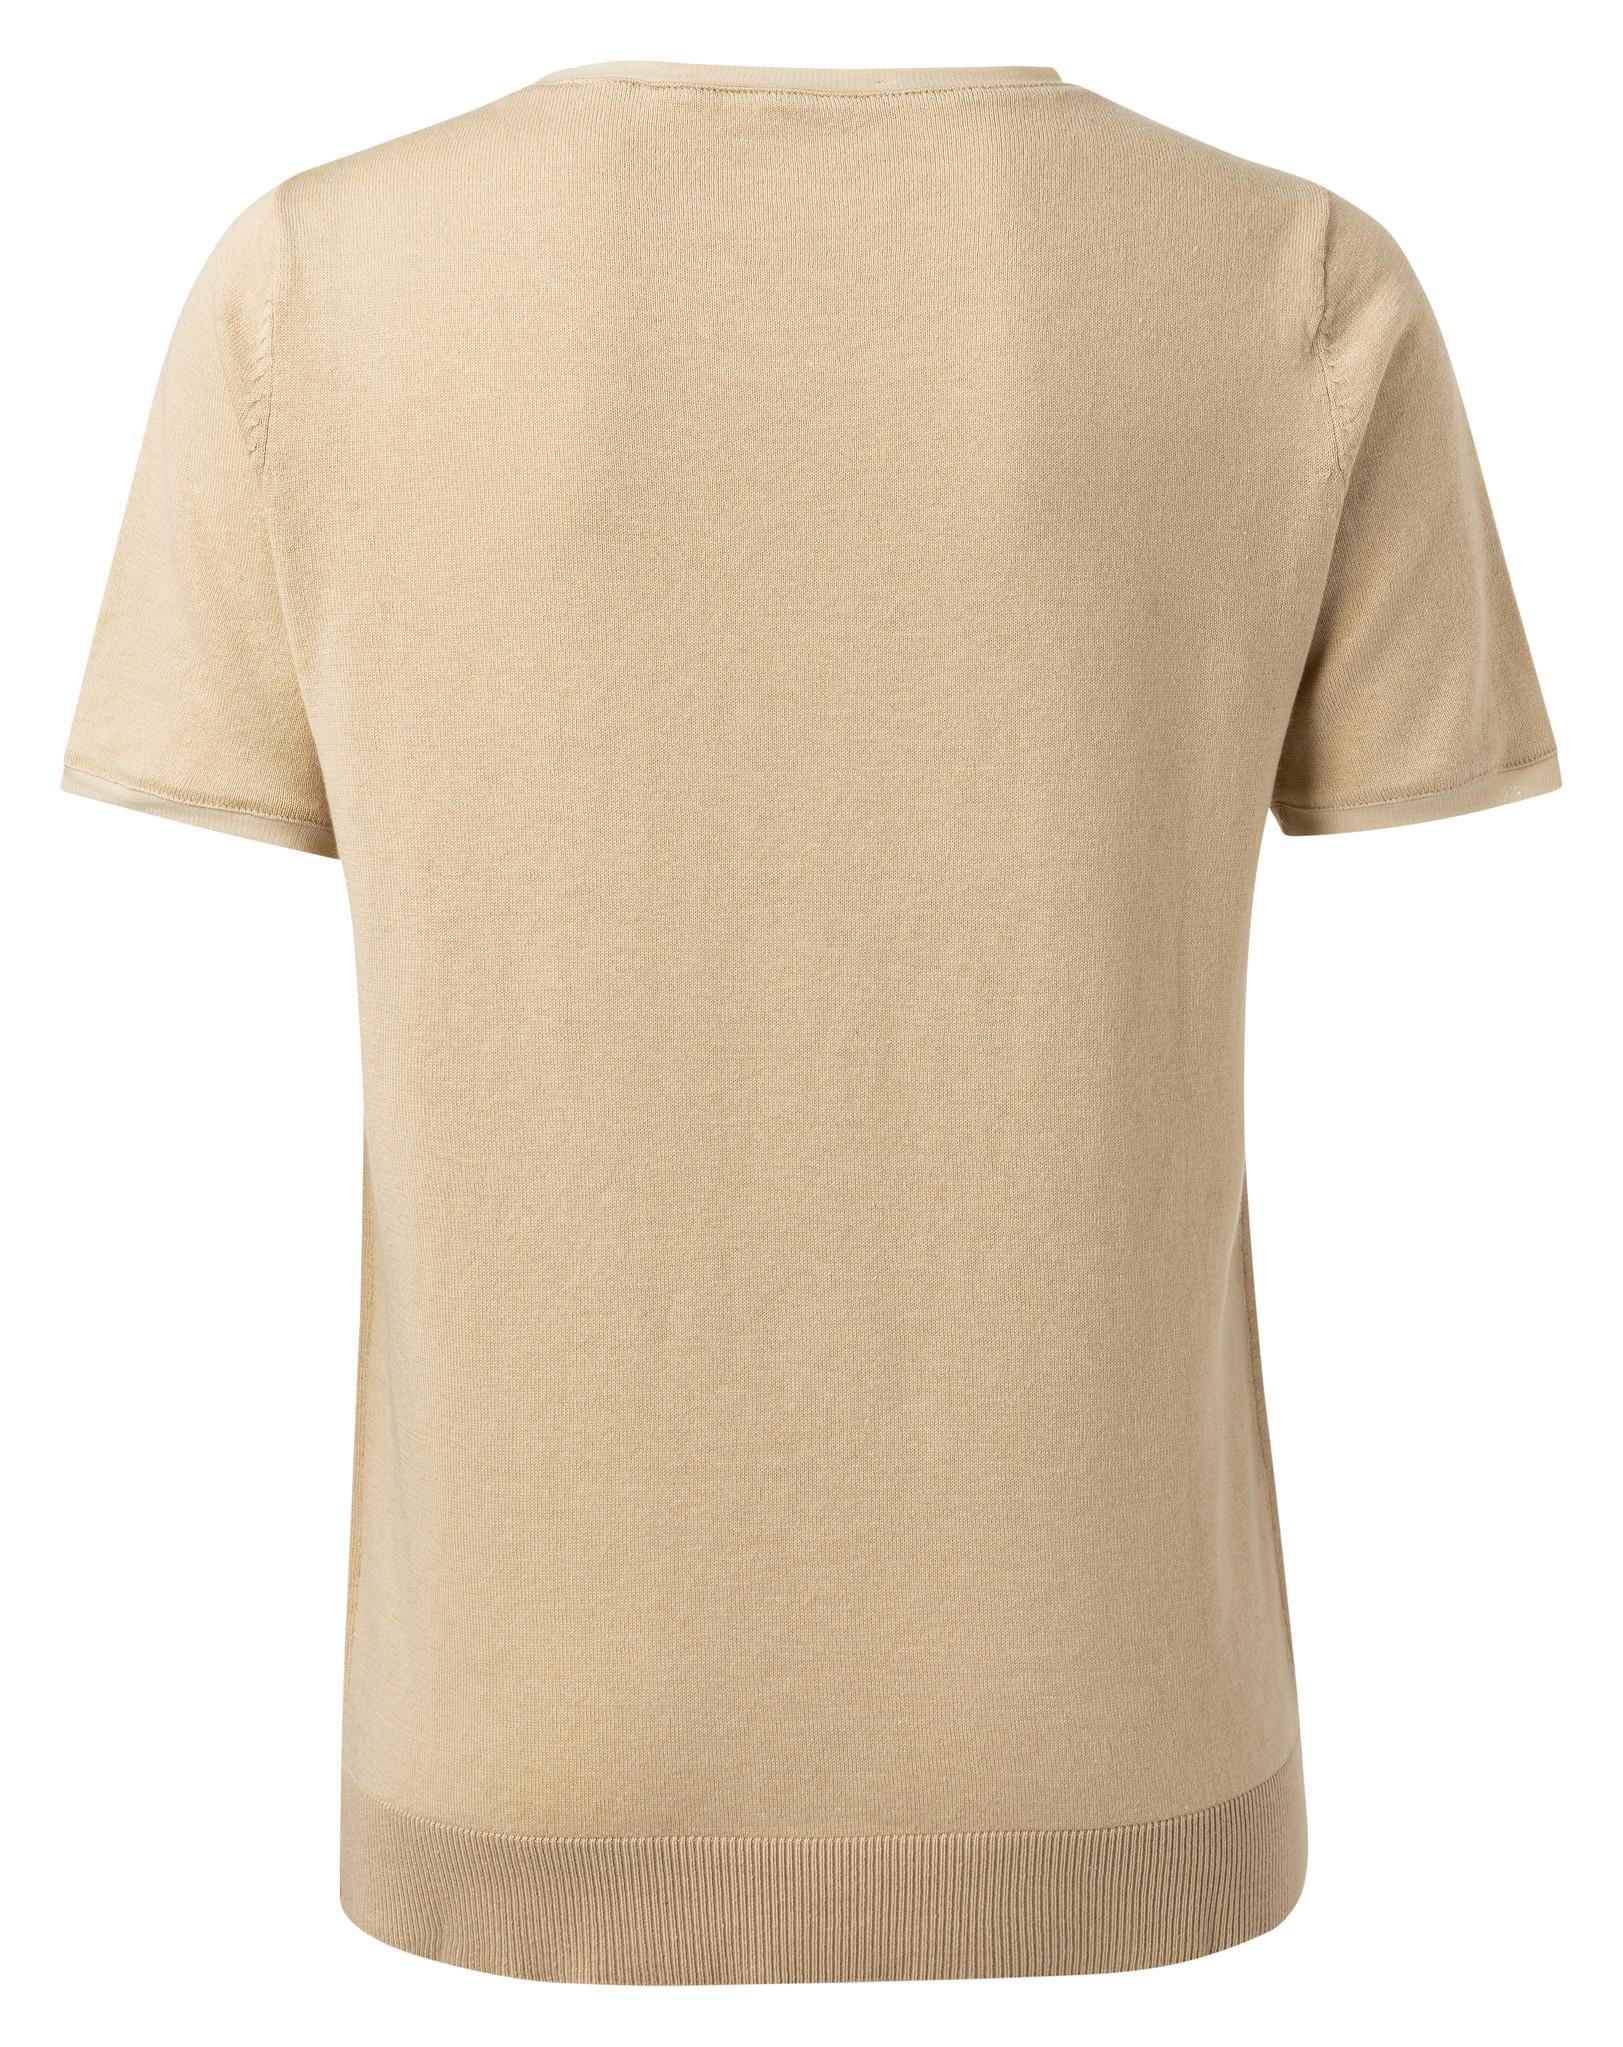 yaya Mesh binding sweater 1000412-112-3